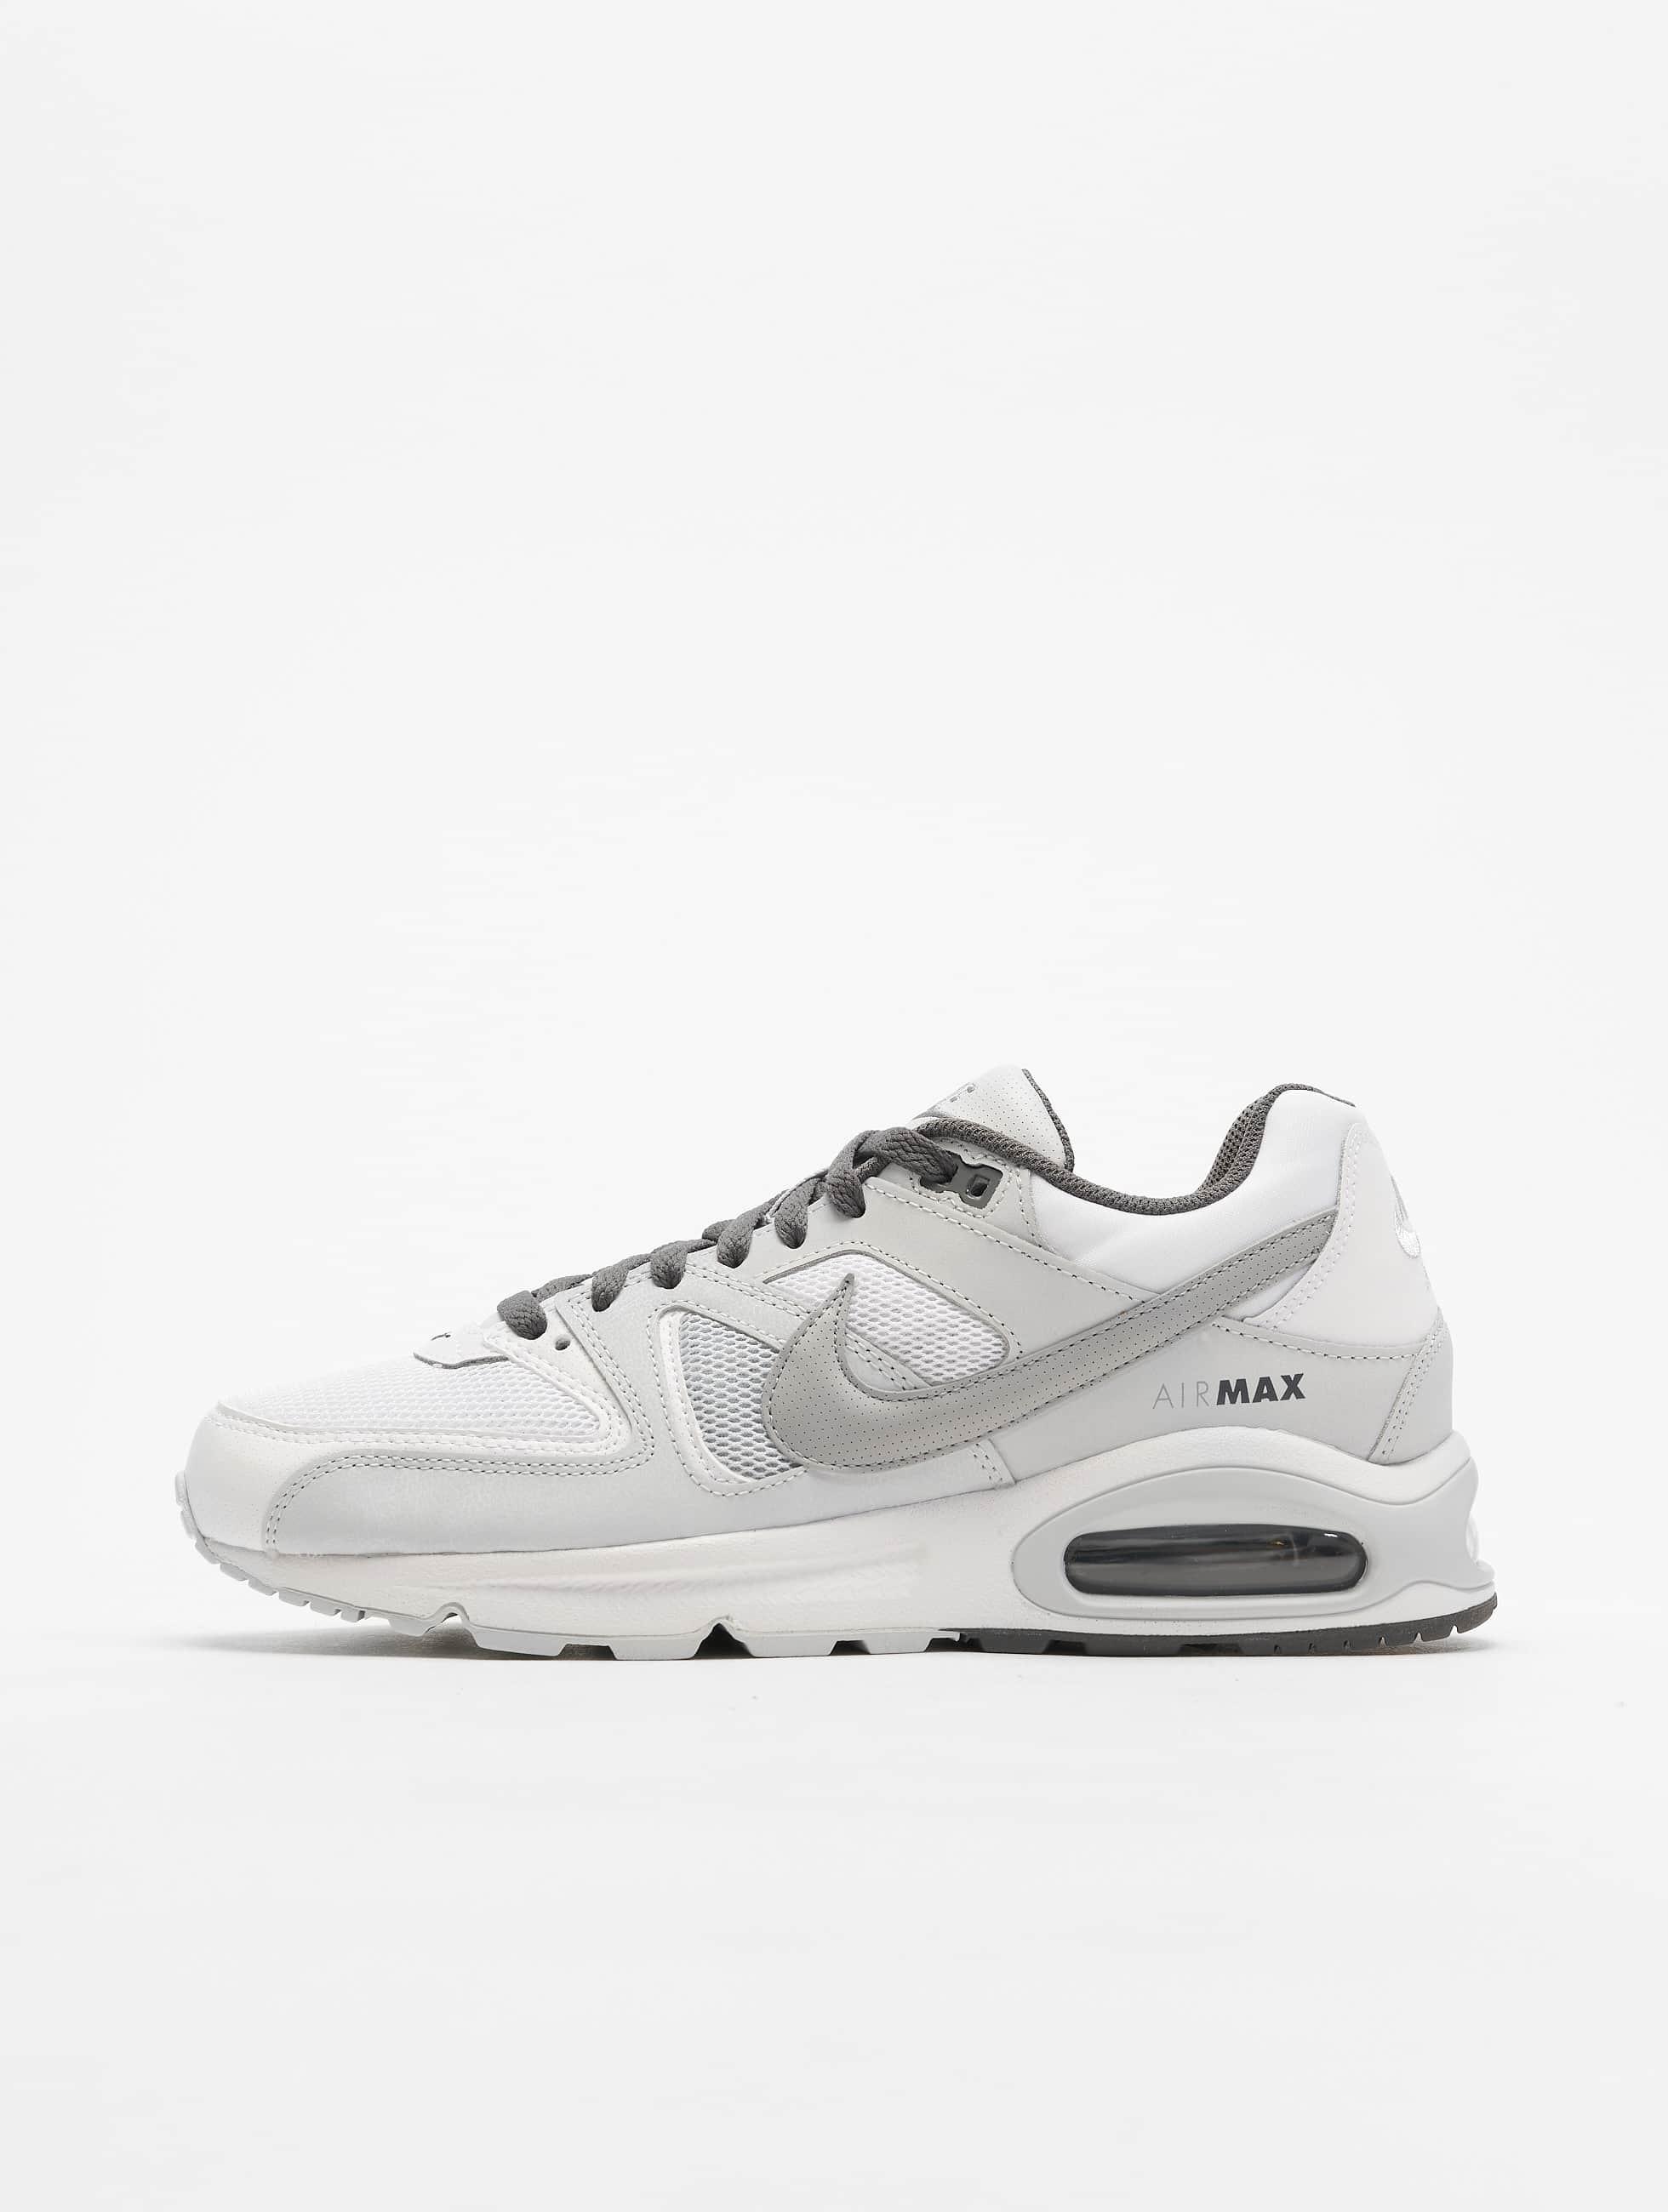 11f96b05d65e0 Nike Herren Fitnessschuhe Air Max Command in weiß 587728